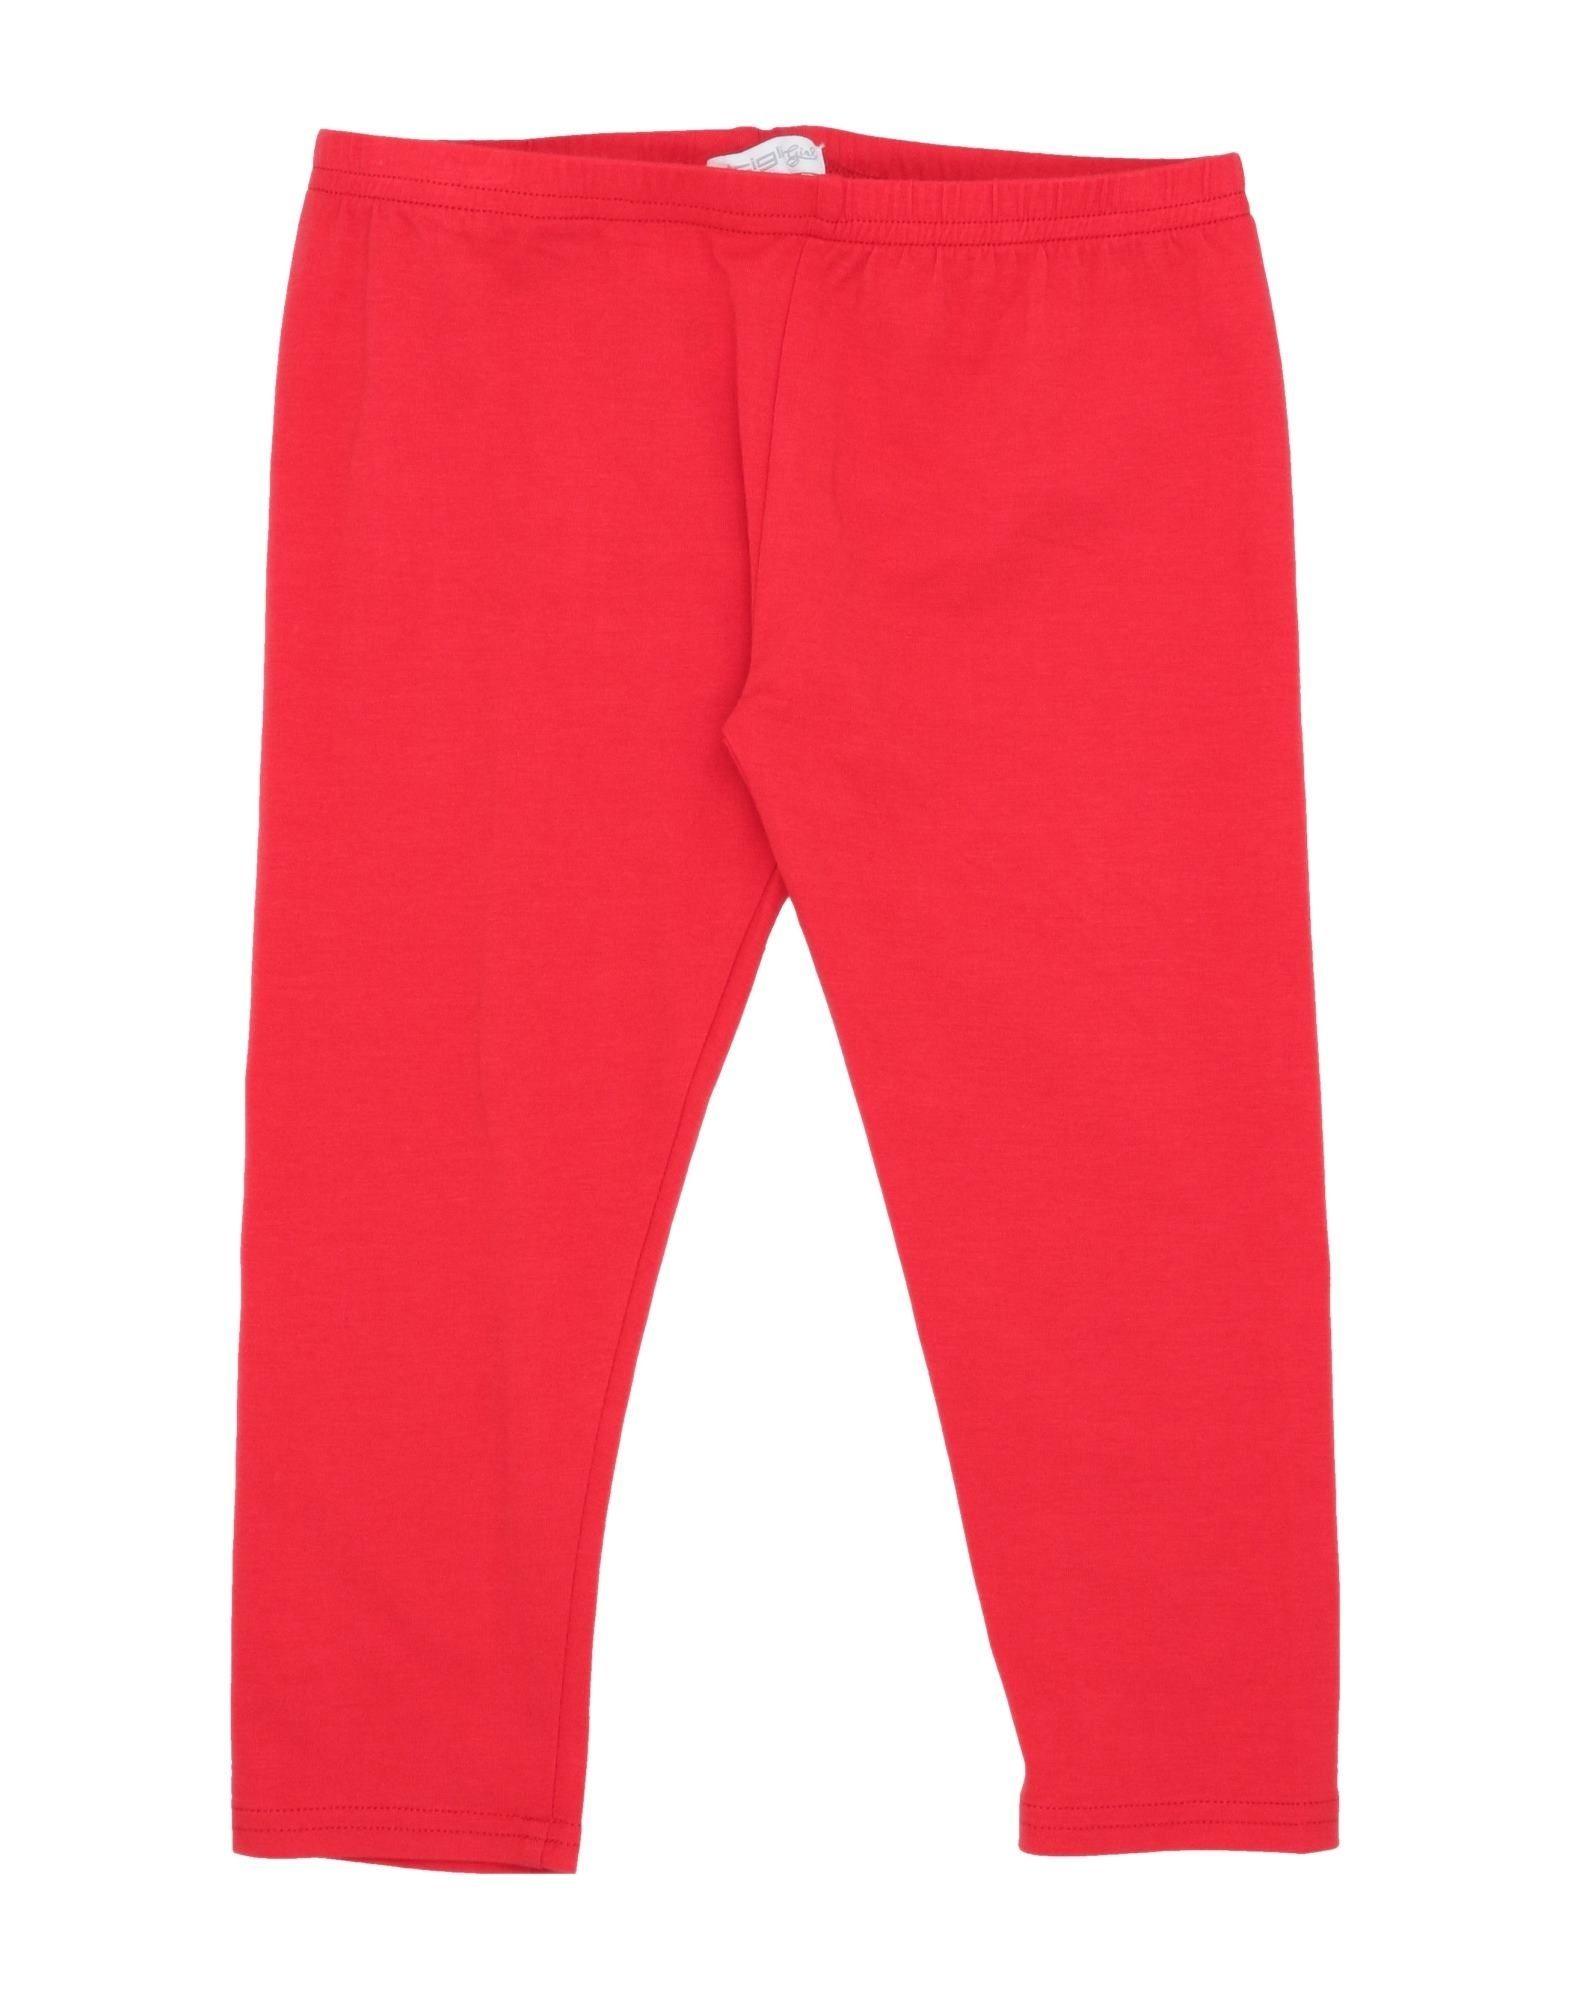 Artigli Girl Kids' Casual Pants In Red